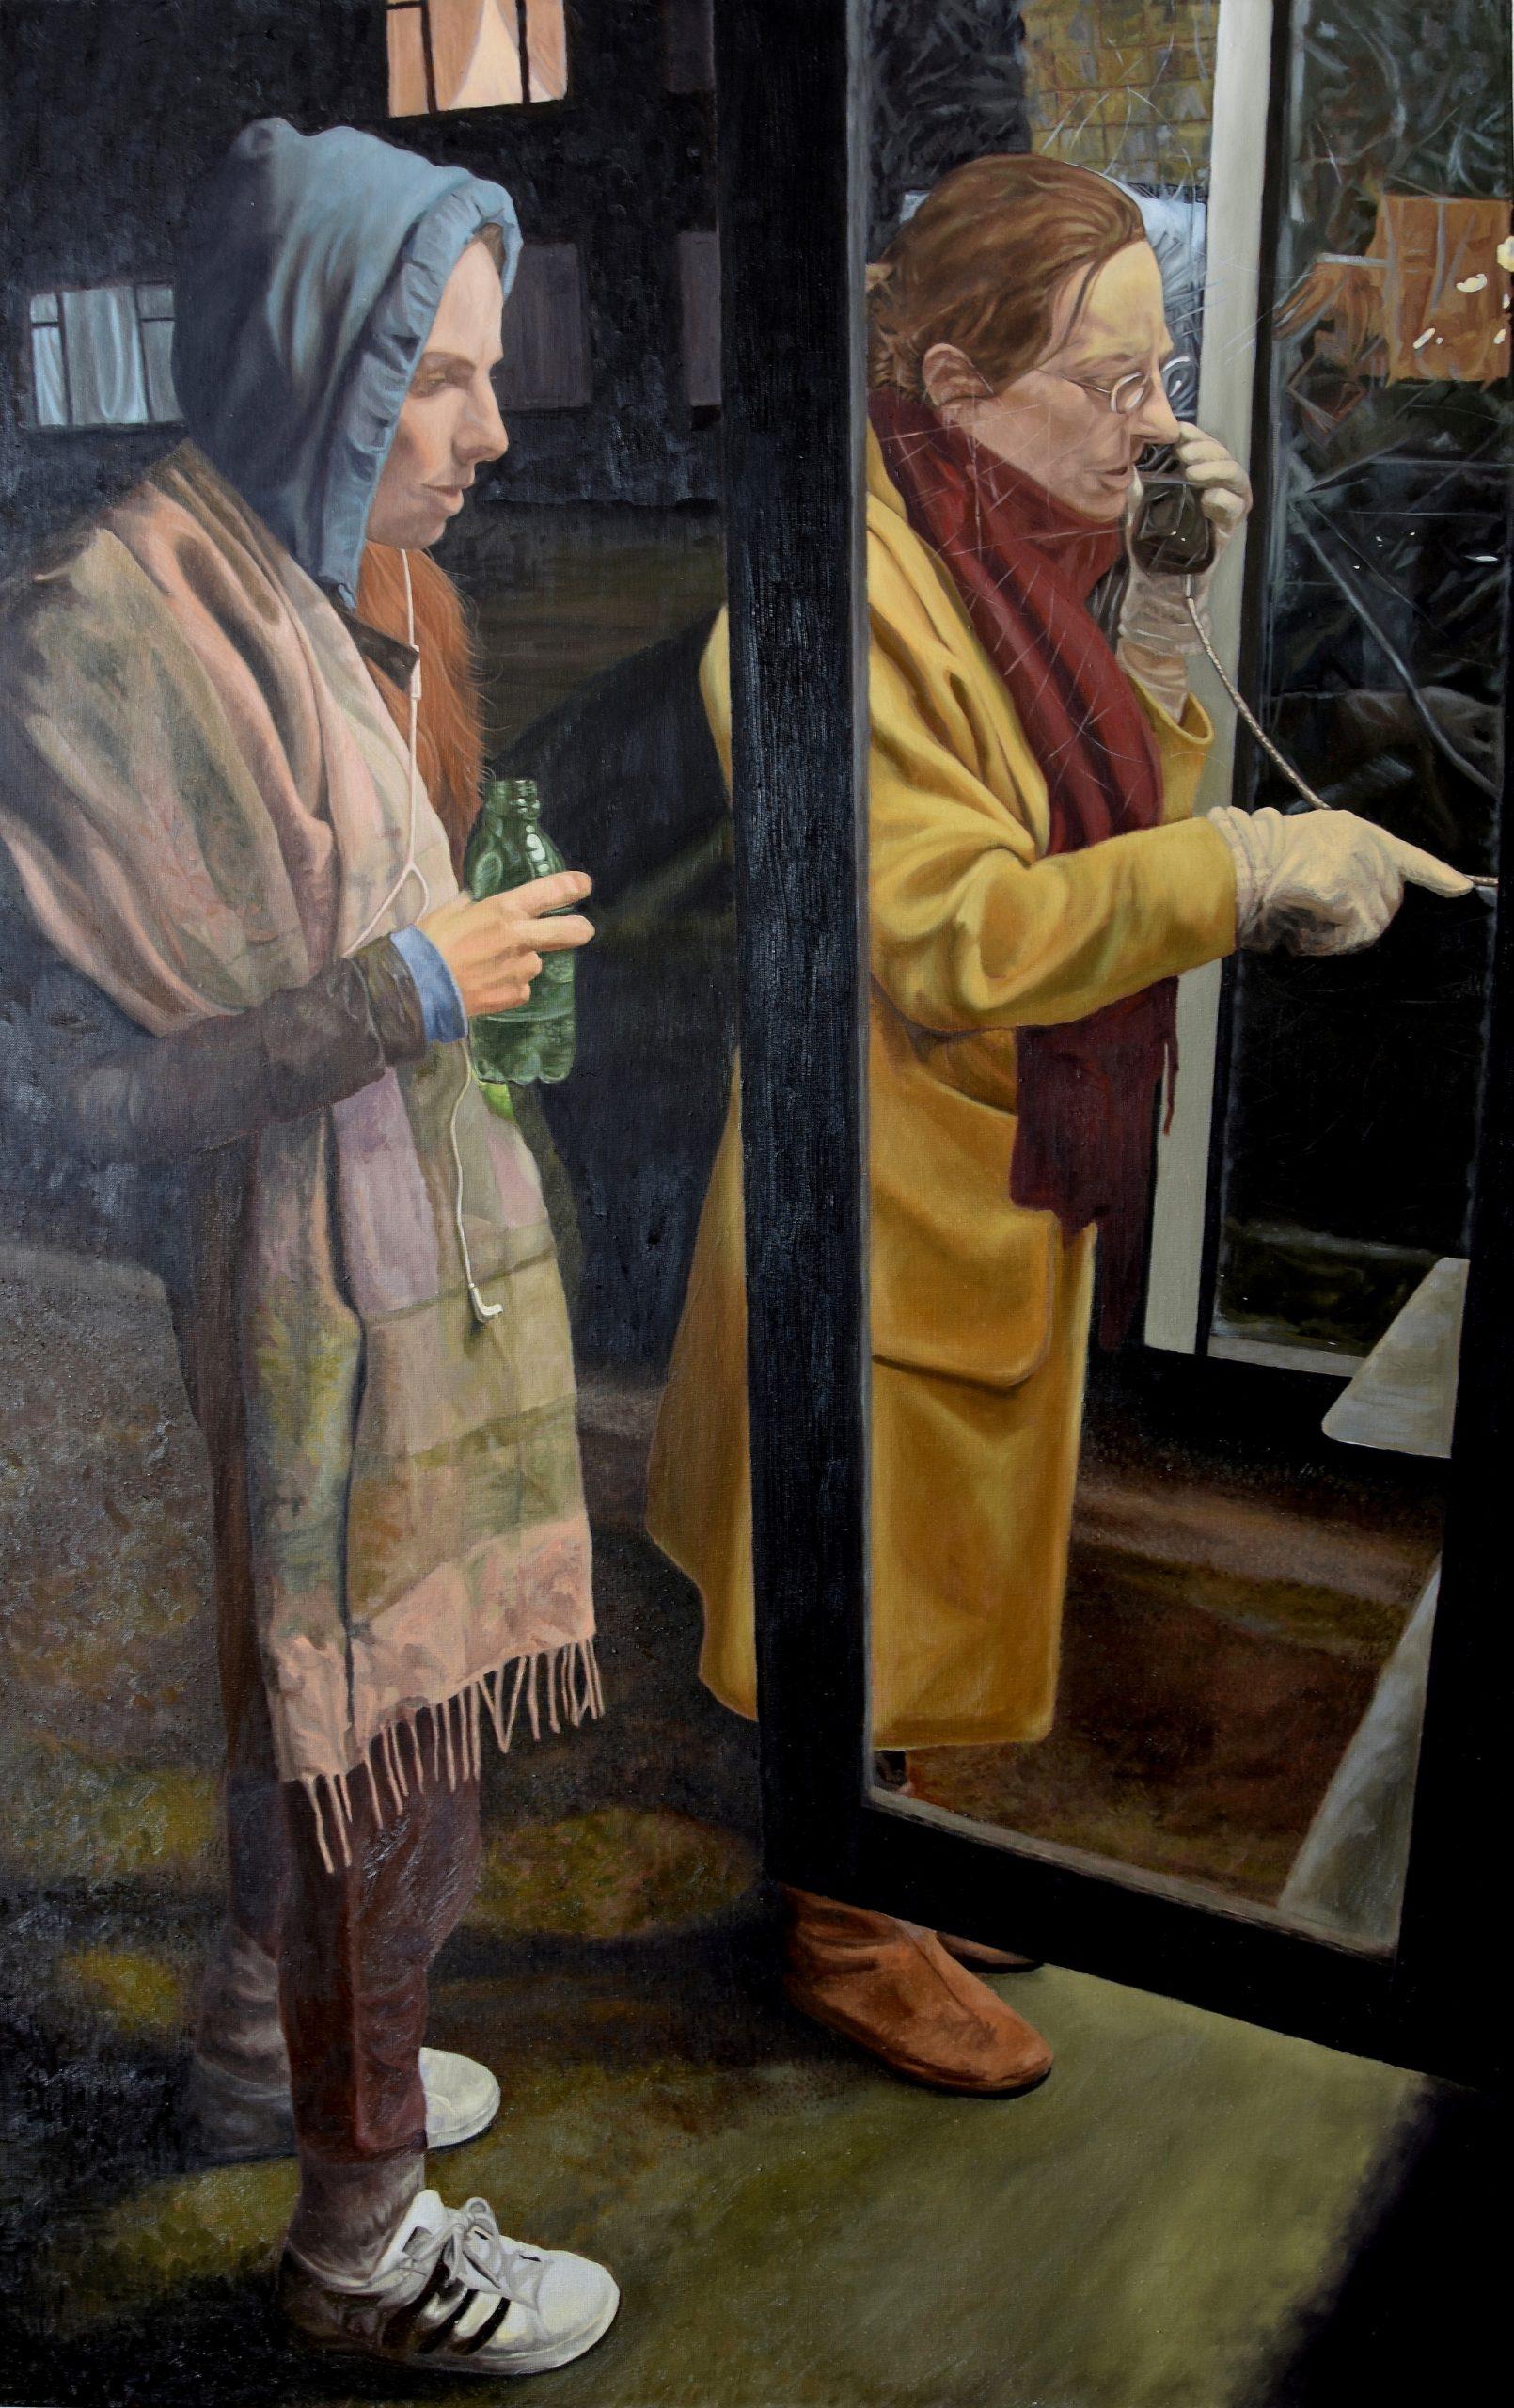 Midnight Call, Hun Adamoglu, 2018, 77 x 122 cm, Oil on Canvas, under 3mb-0e5fb661